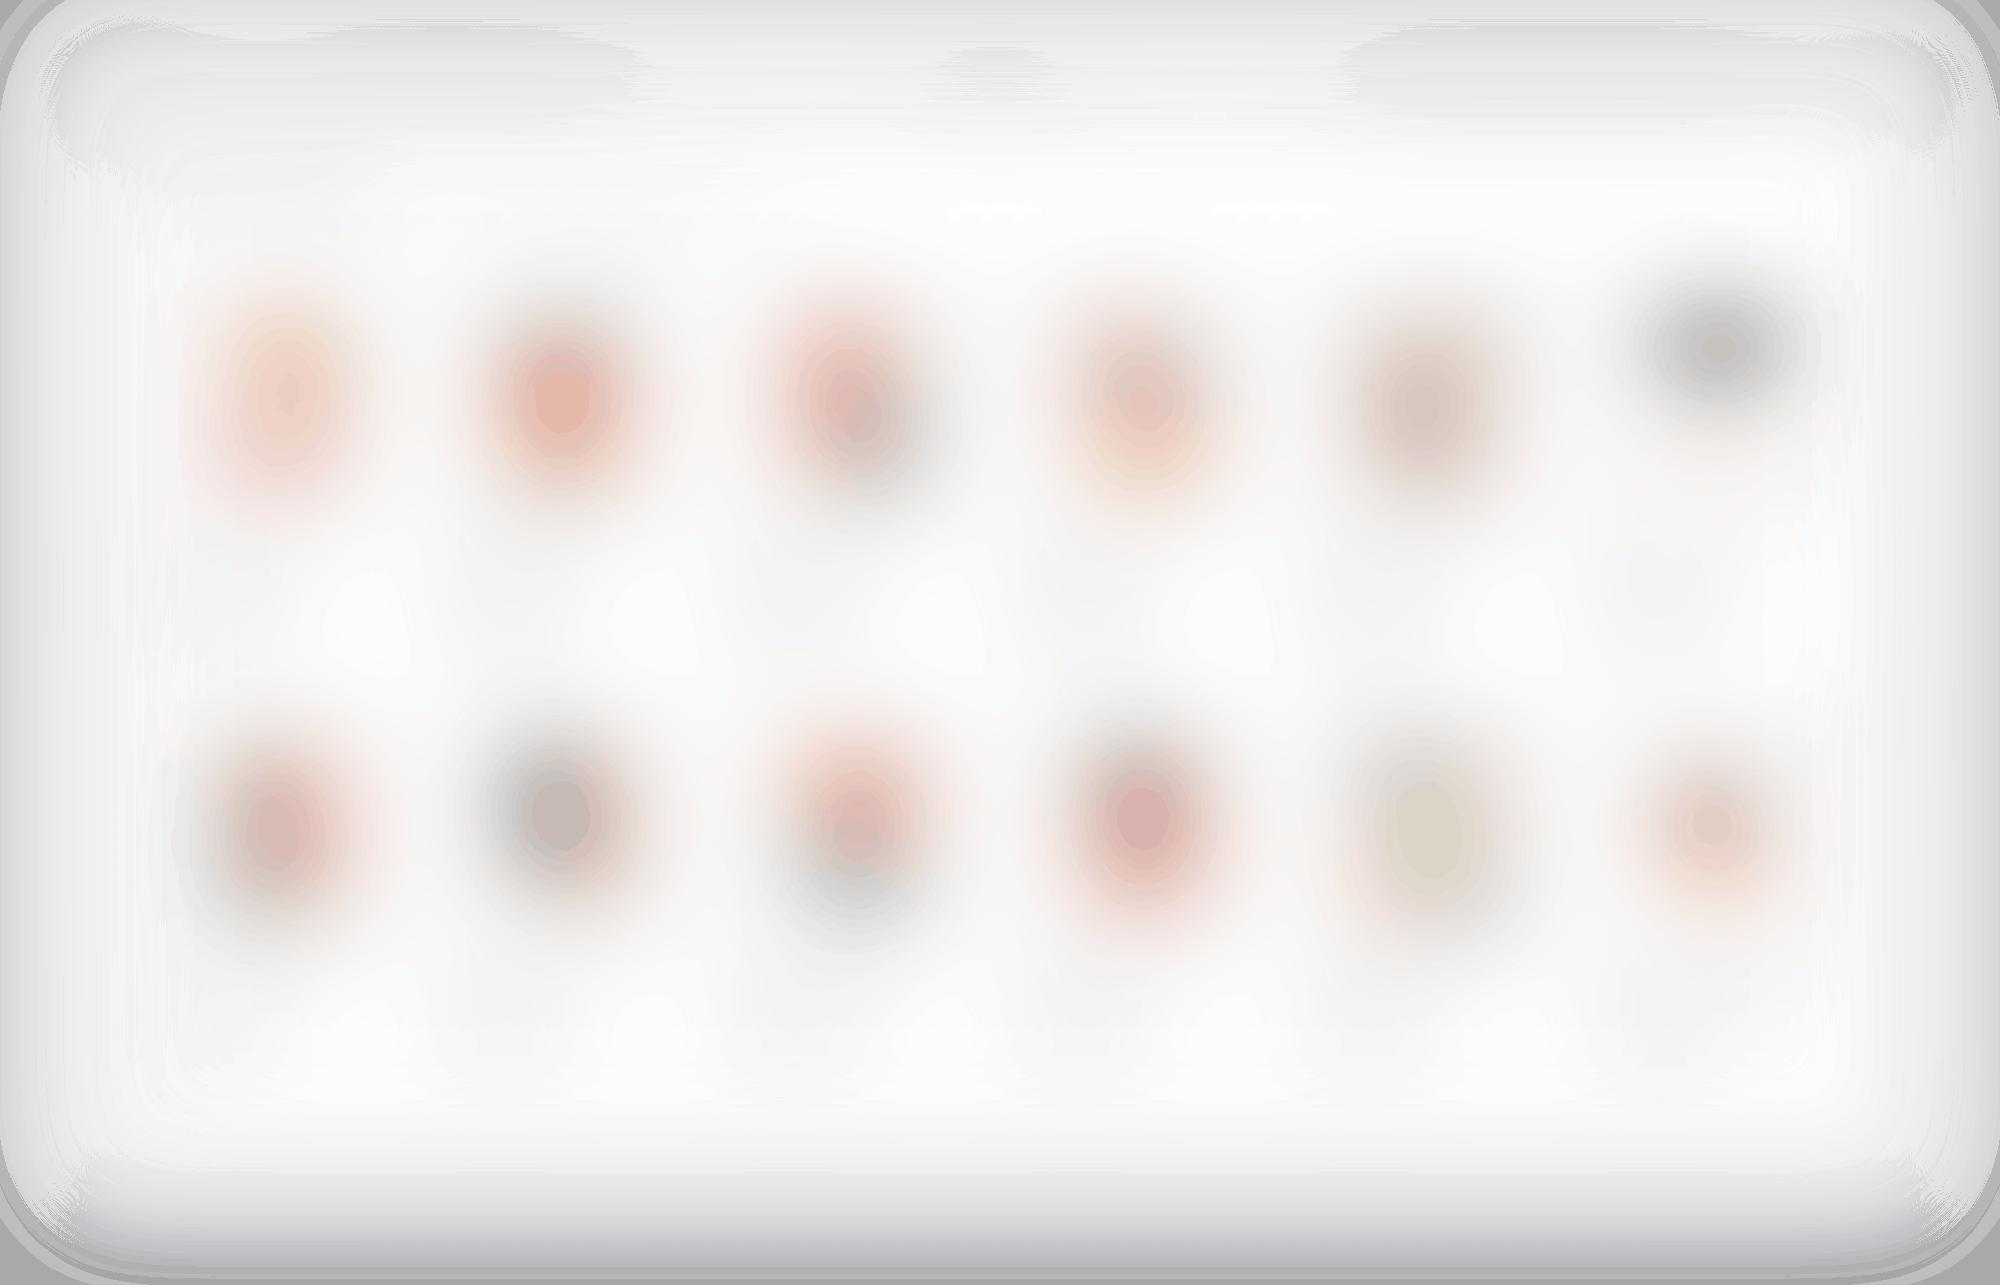 Screenshot 2020 09 29 at 09 47 47 autocompressfitresizeixlibphp 1 1 0max h2000max w3 D2000q80sdc00d53d45b4c2a580fc17ef9b8c7063